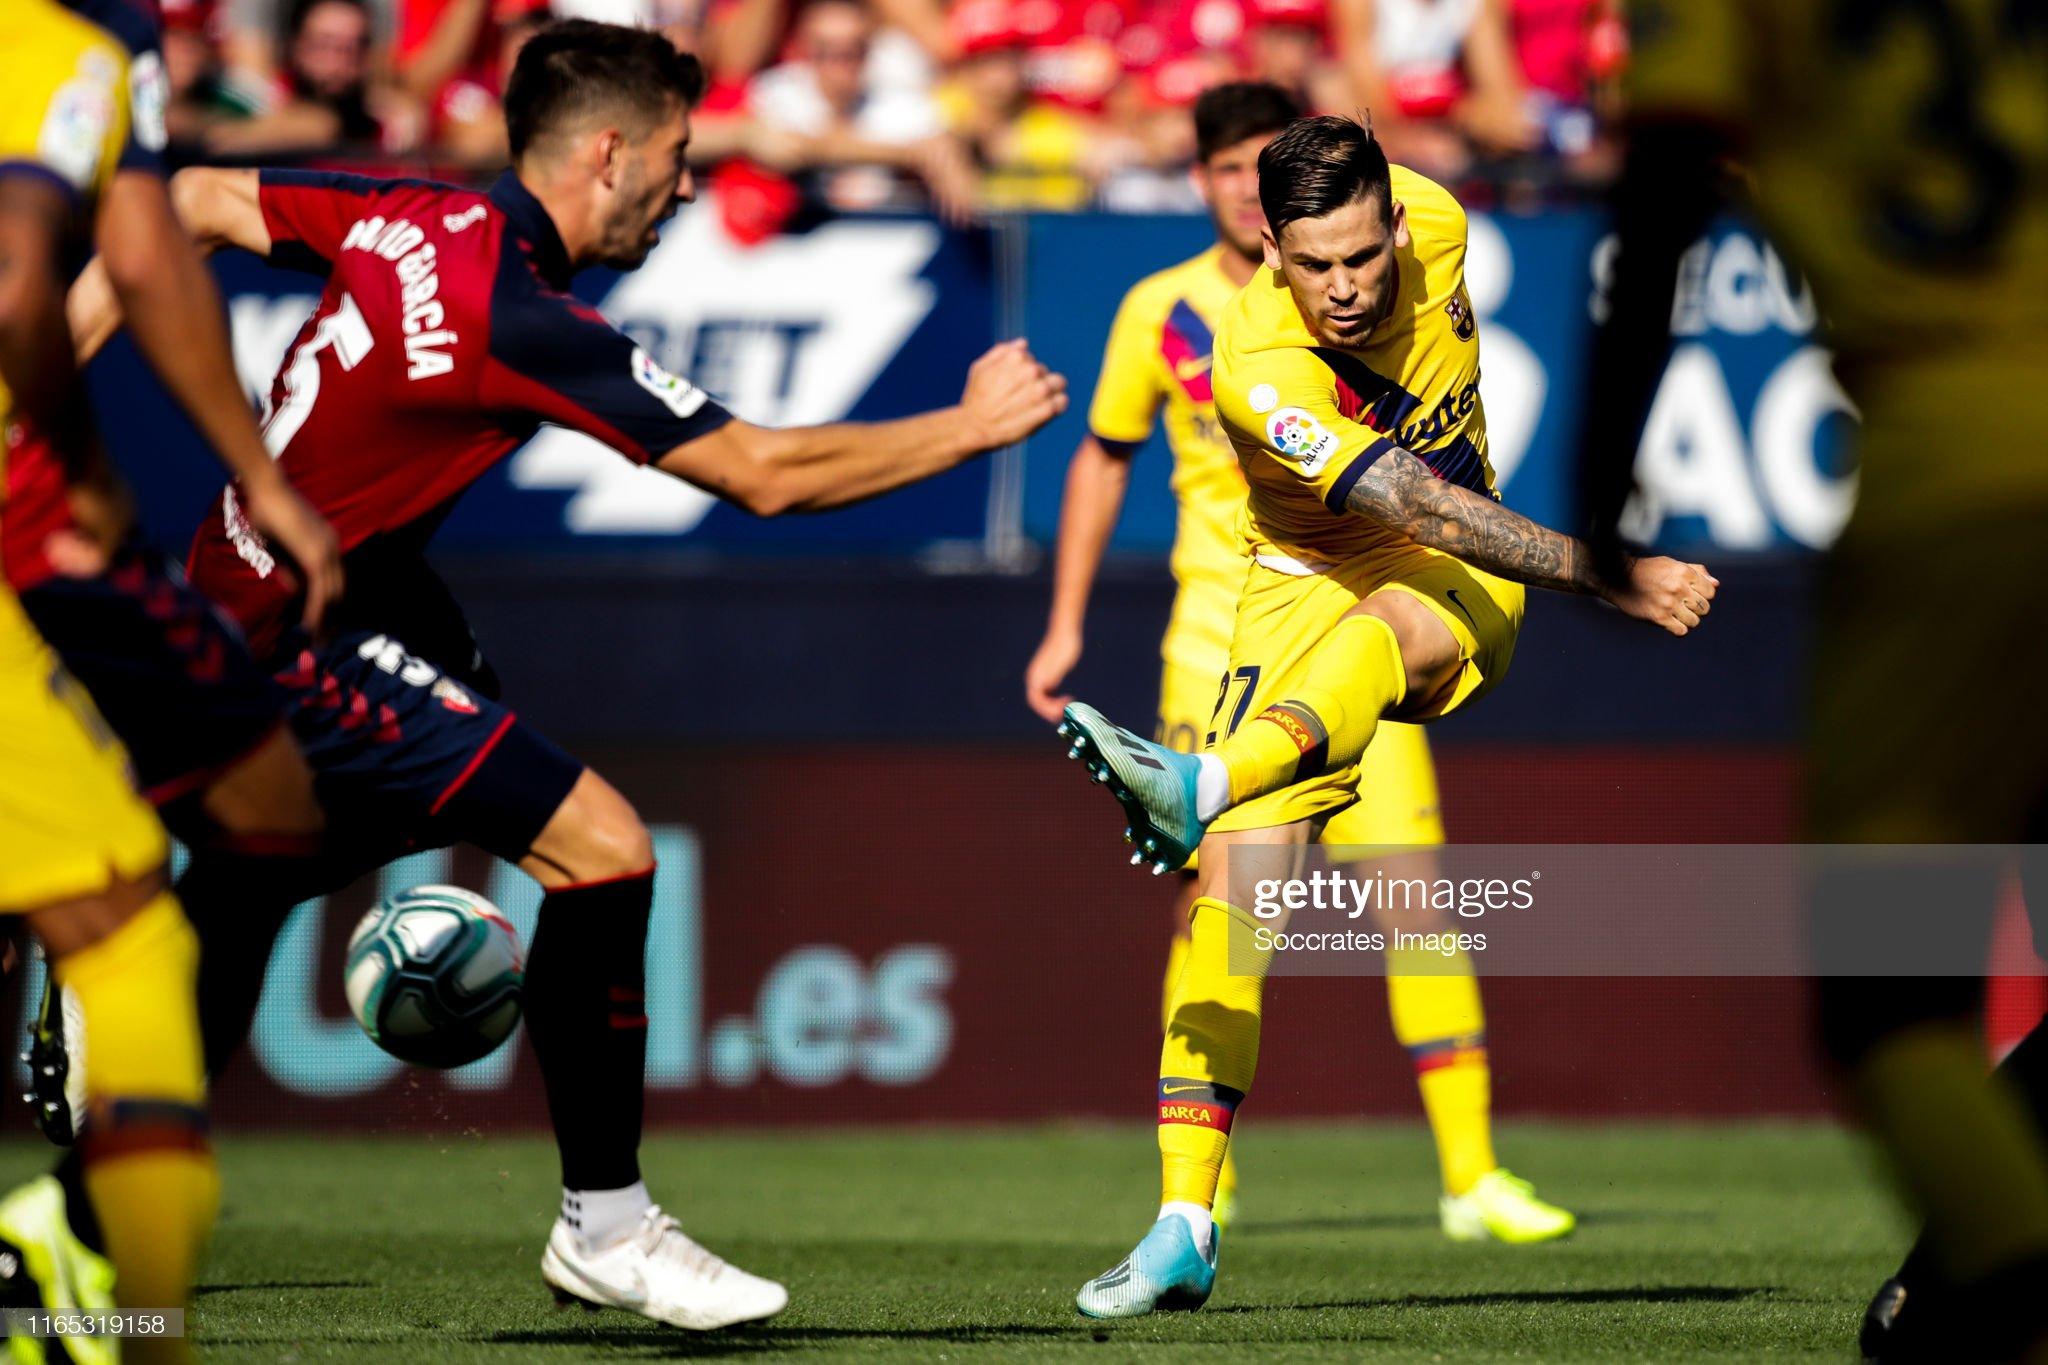 صور مباراة : أوساسونا - برشلونة 2-2 ( 31-08-2019 )  Carles-perez-of-fc-barcelona-during-the-la-liga-santander-match-v-picture-id1165319158?s=2048x2048